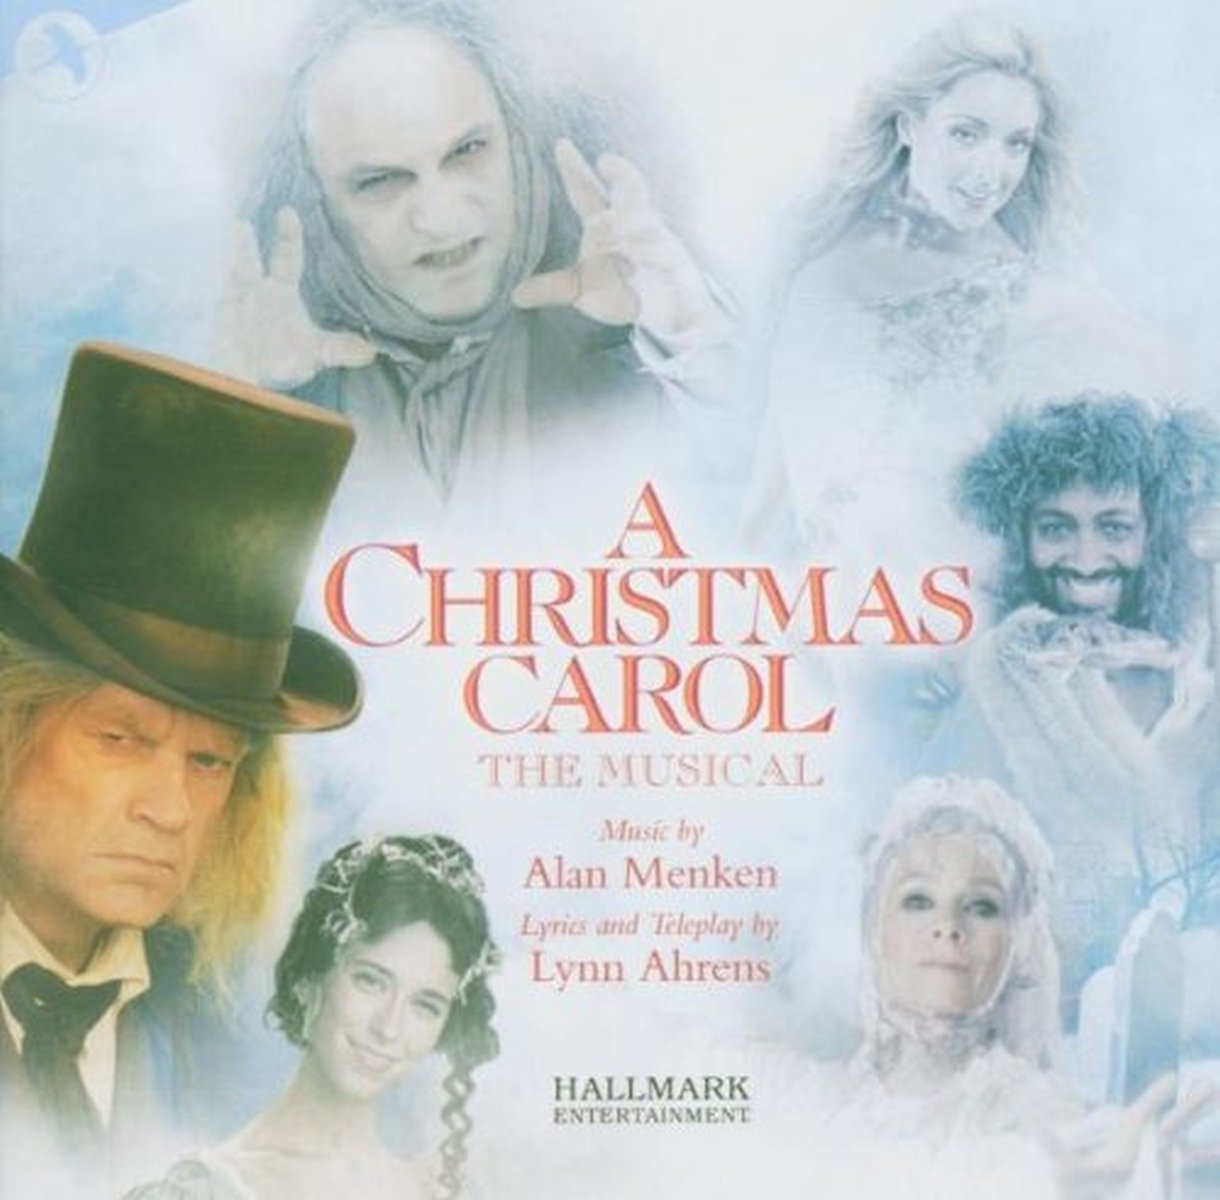 A Christmas Carol: The Musical [DVD]: Amazon.co.uk: Kelsey Grammer ...